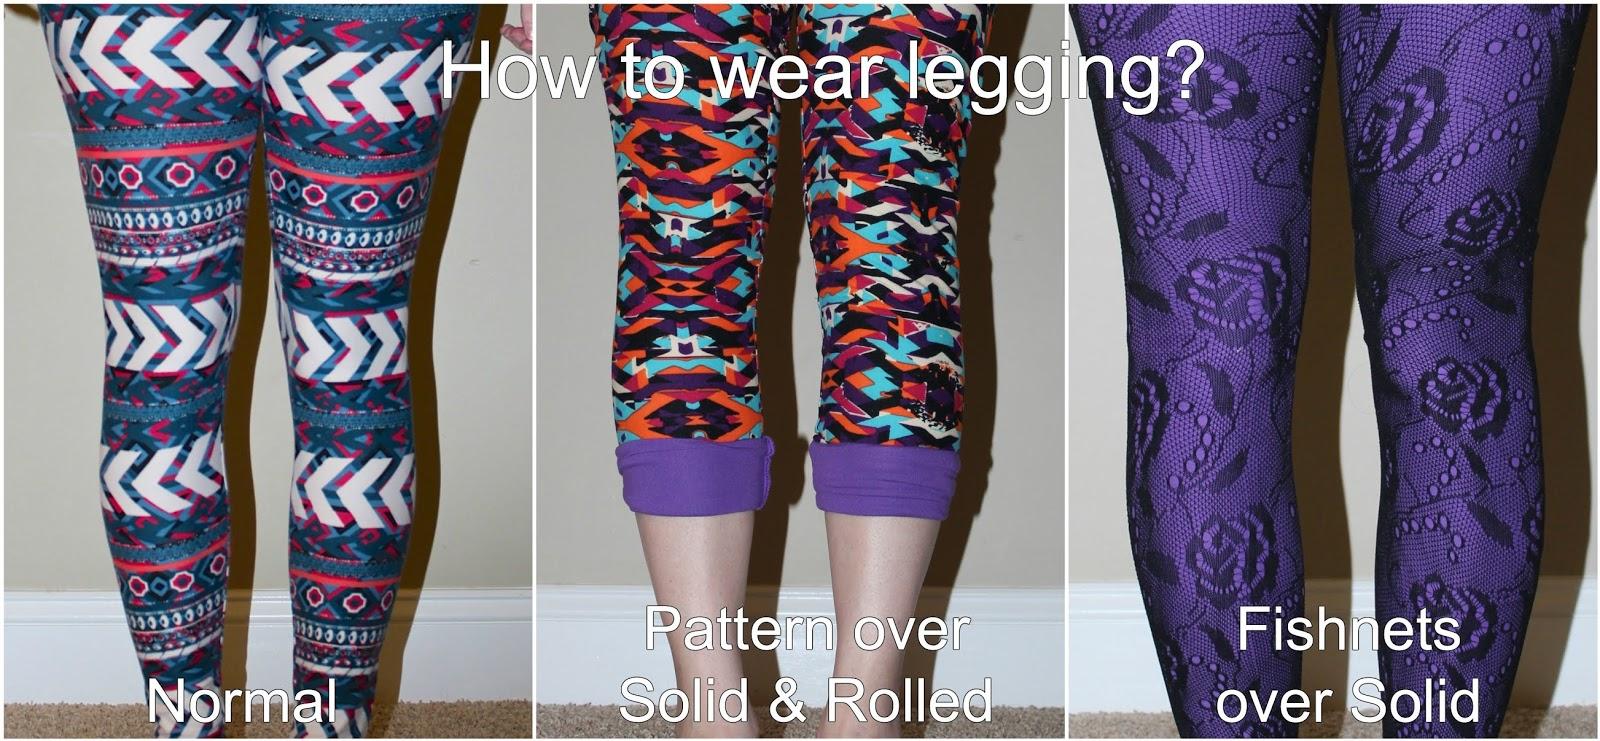 LulaRoe Part 2: Leggings - sizes, styling tips, legging